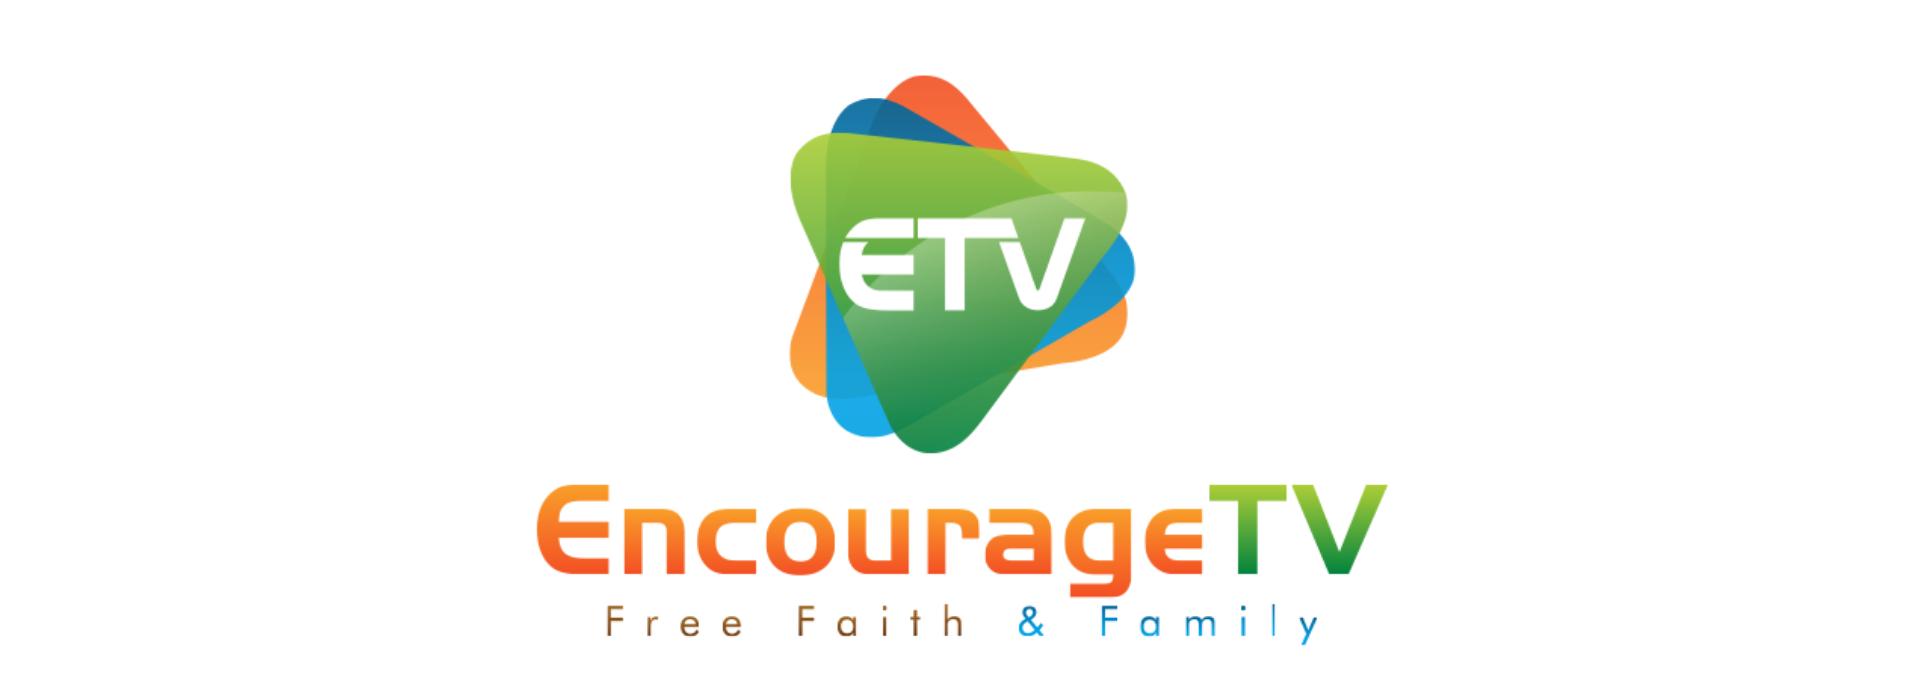 #EncourageTV channel